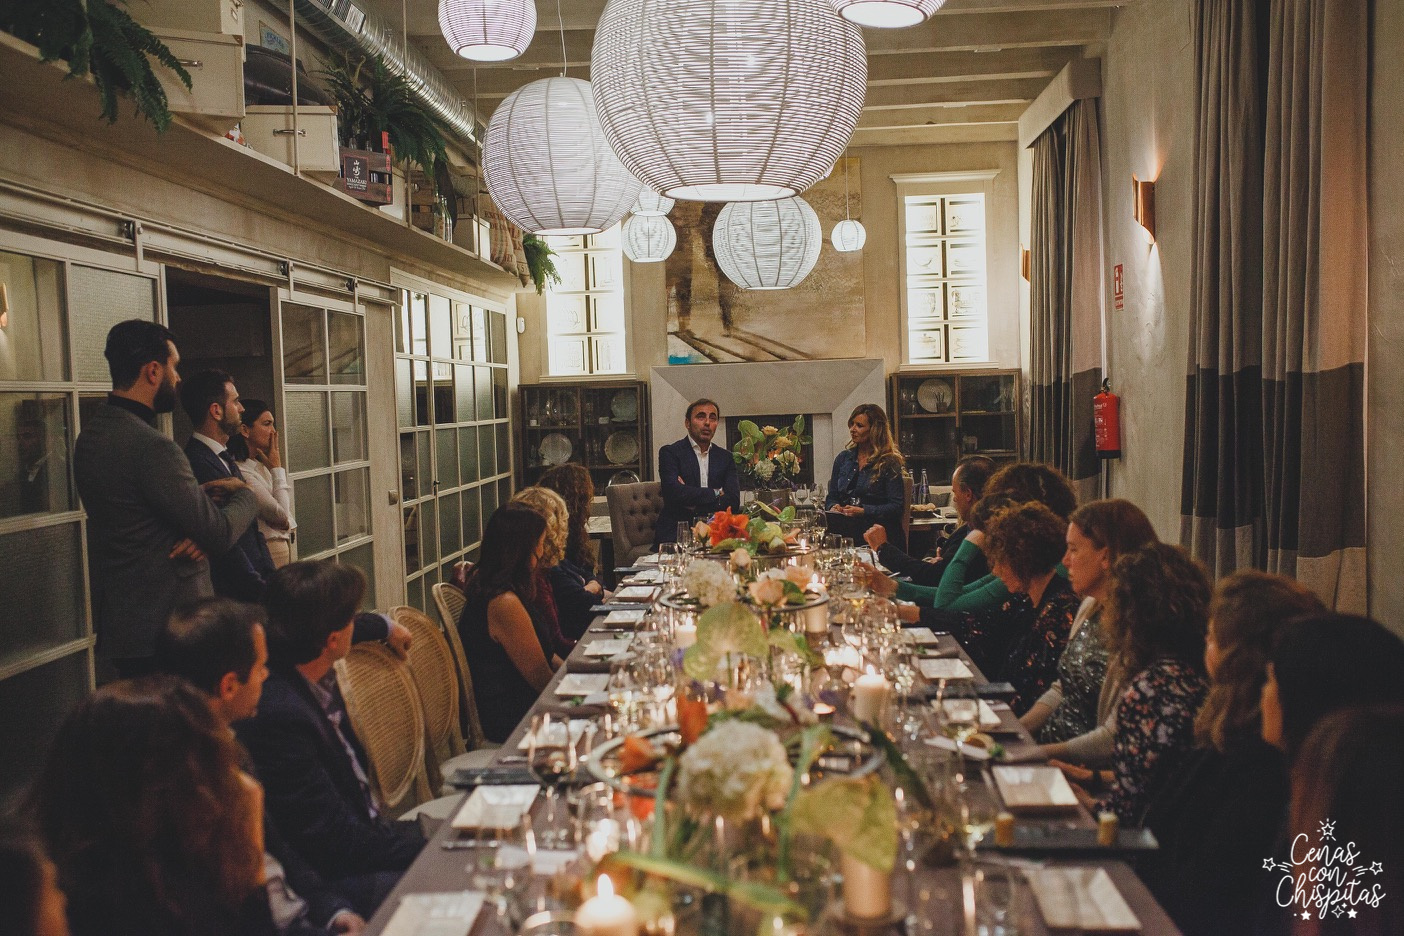 Cenas con Chispitas- Andrés-Olivares-127